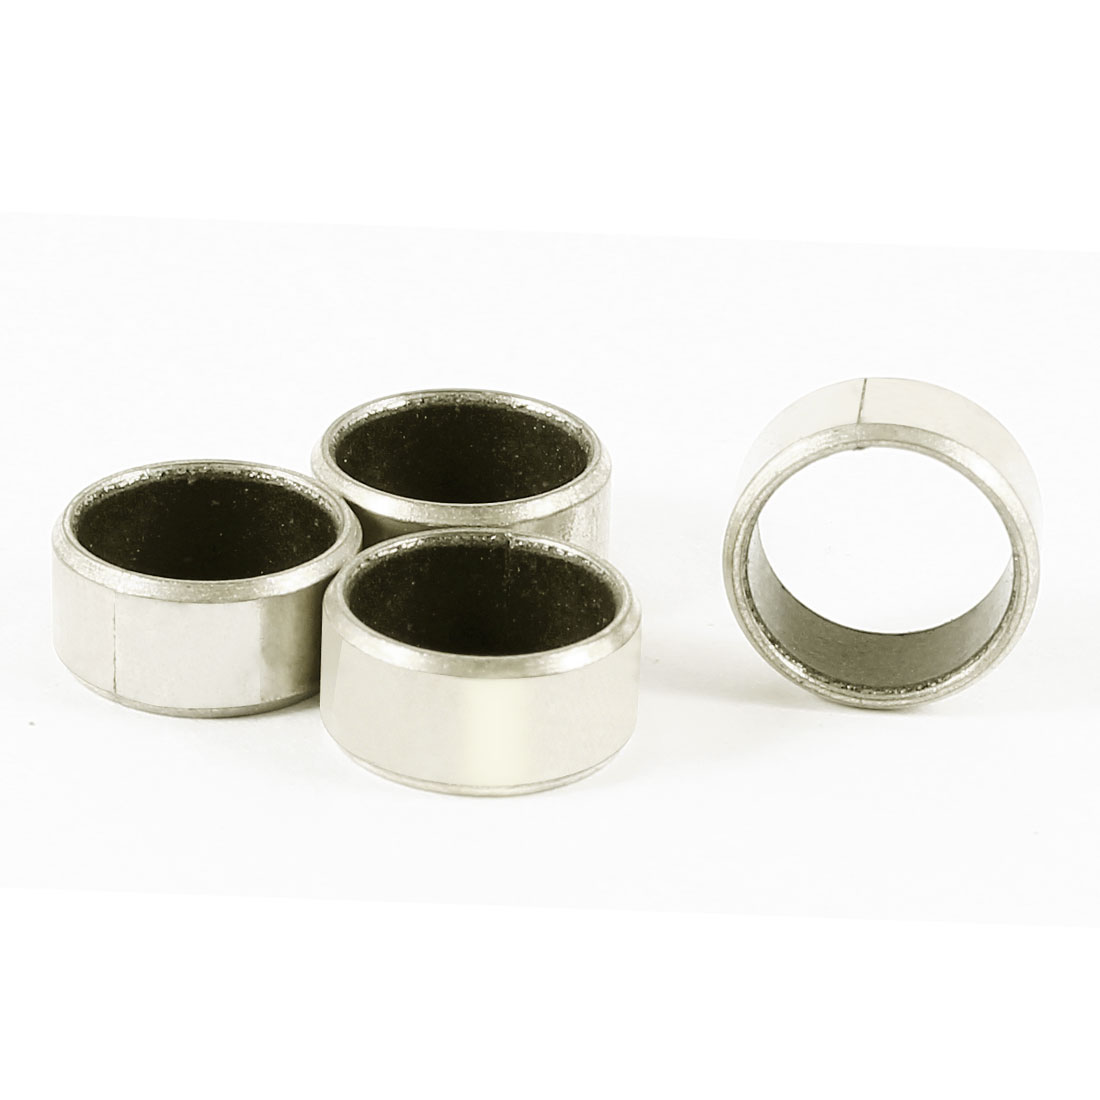 4pcs Silver Tone Self Lubricating Metal Plain Bearing Sleeve 6mm x 12mm x 10mm